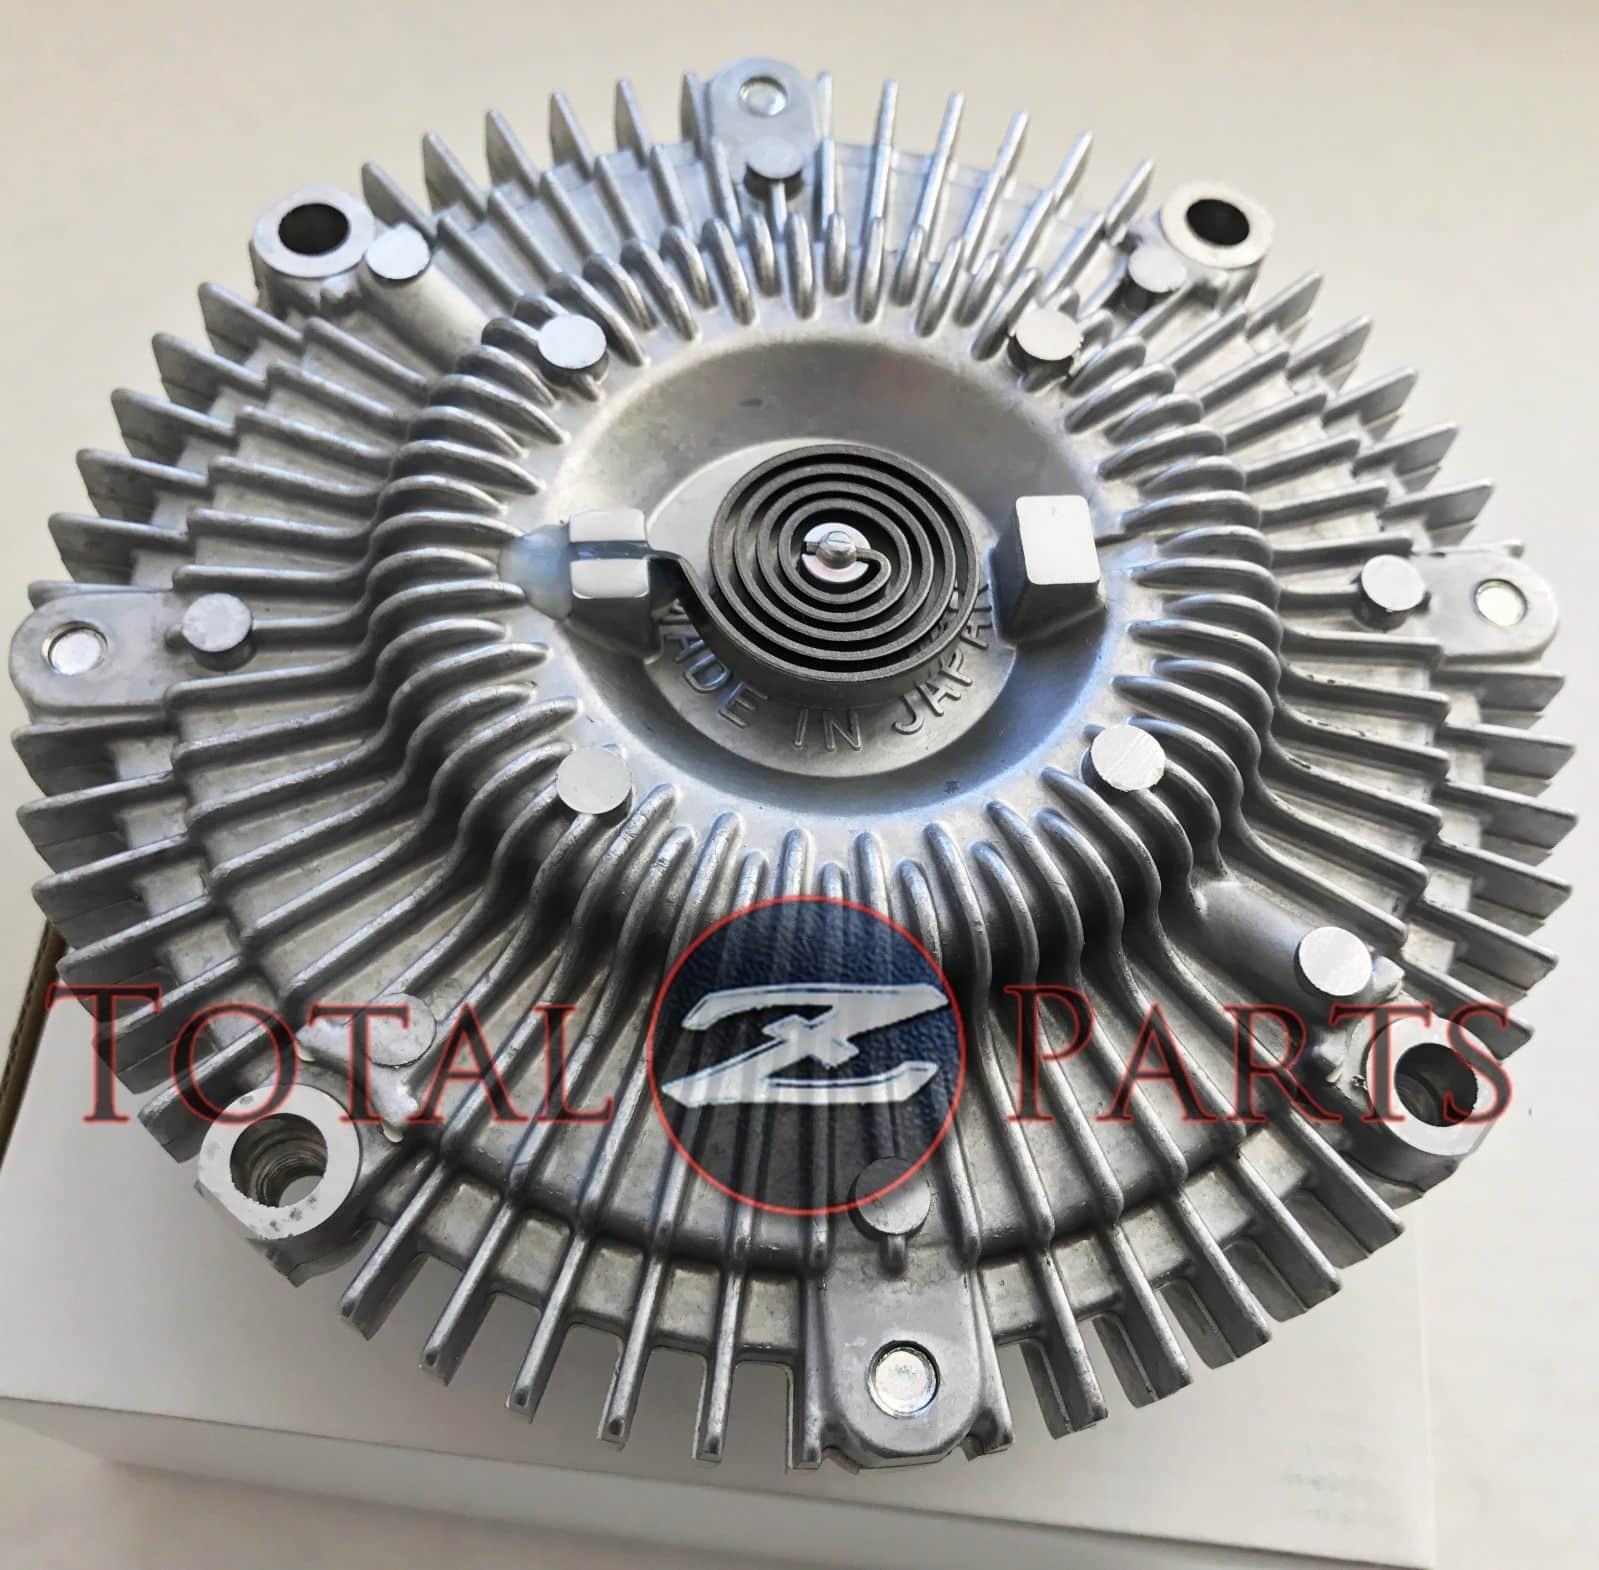 hight resolution of datsun 240z 260z 280z 280zx engine radiator cooling fan clutch new made in japan